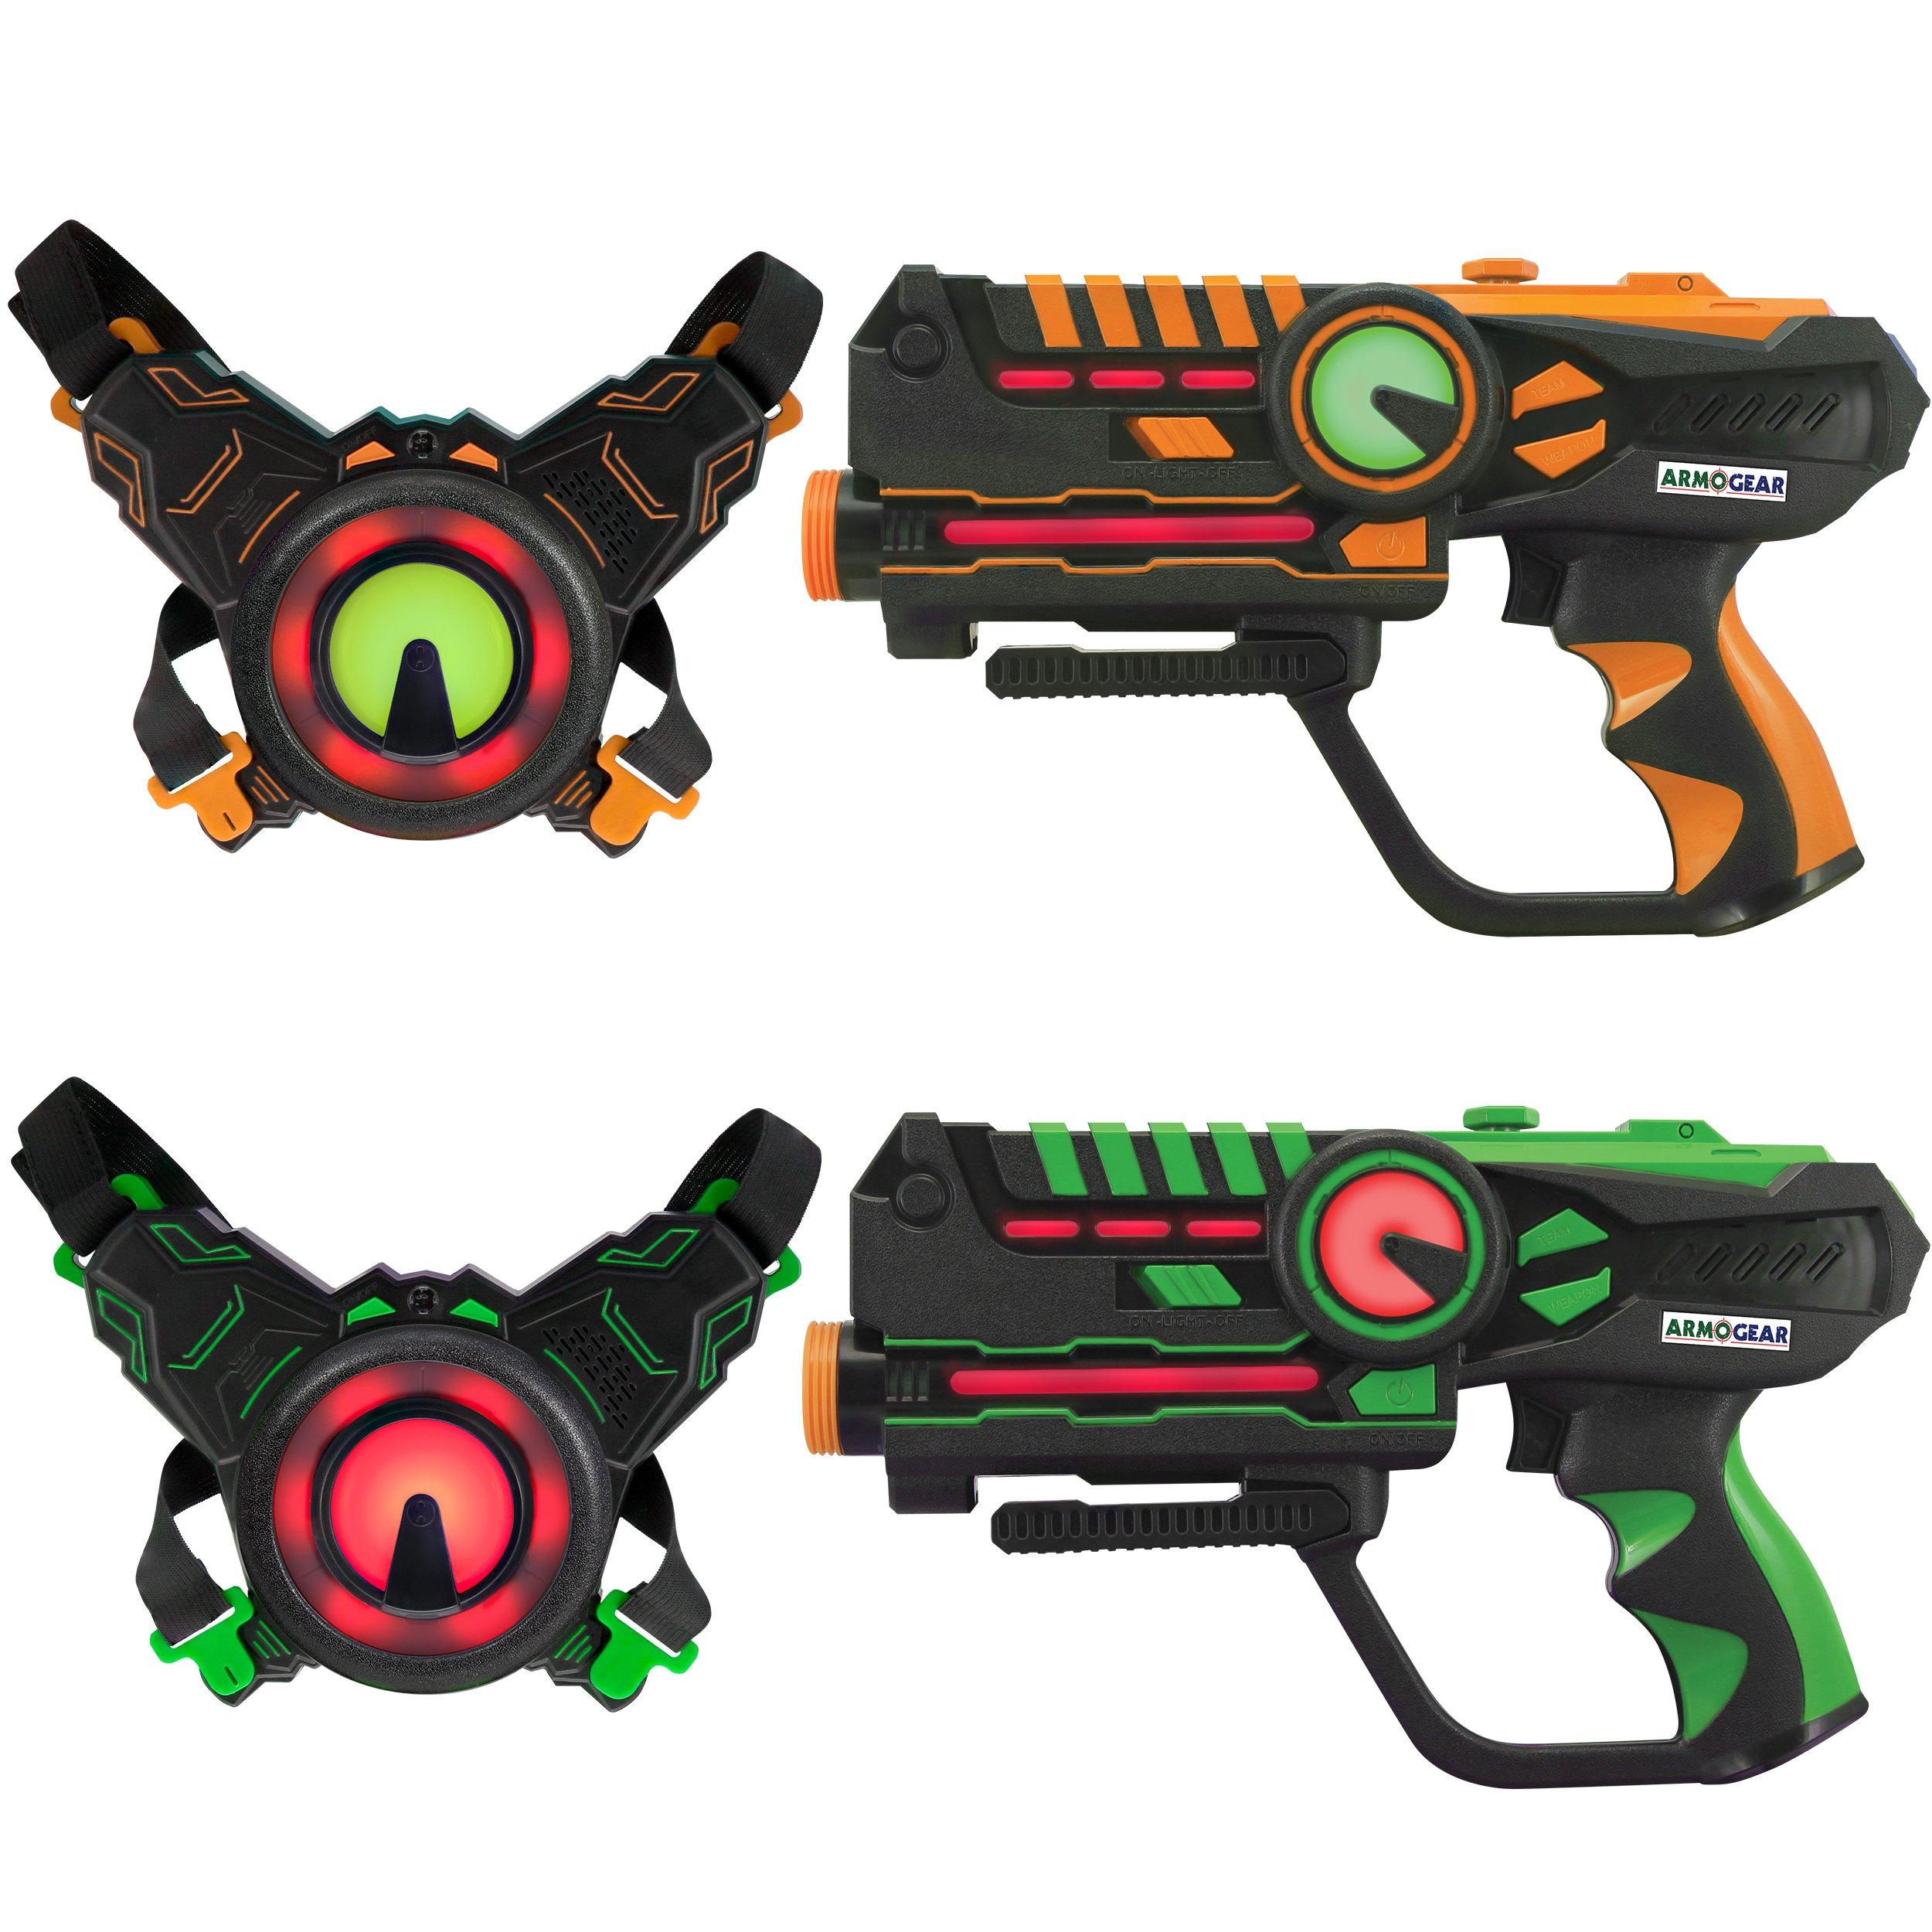 ArmoGear Infrared Laser Tag Guns and Vests - Laser Battle Game - Pack Set of 2 - Infrared 0.9mW